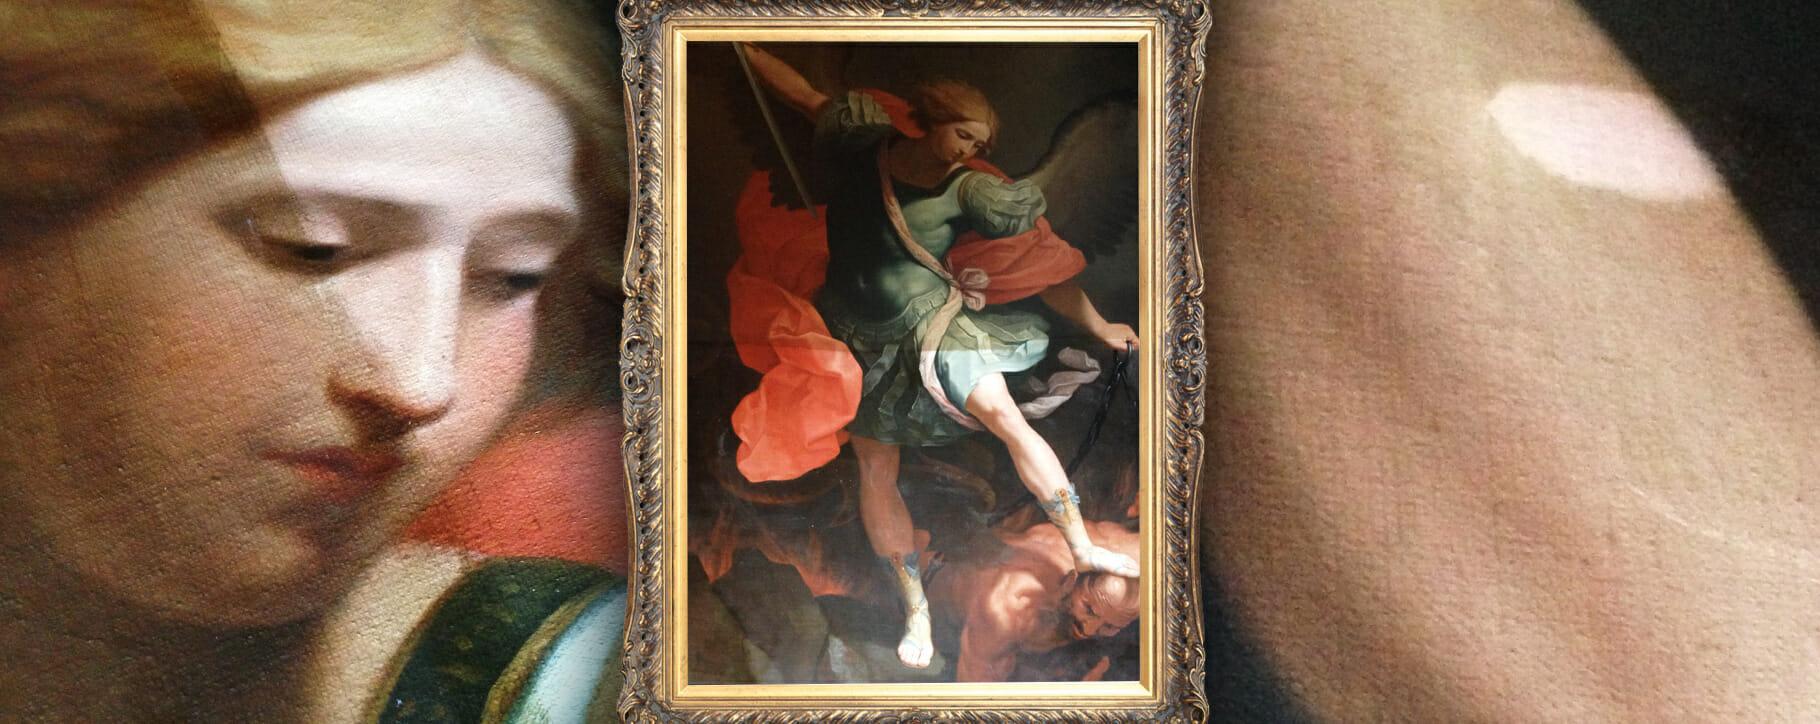 Saint Michael Religious Art Restoration